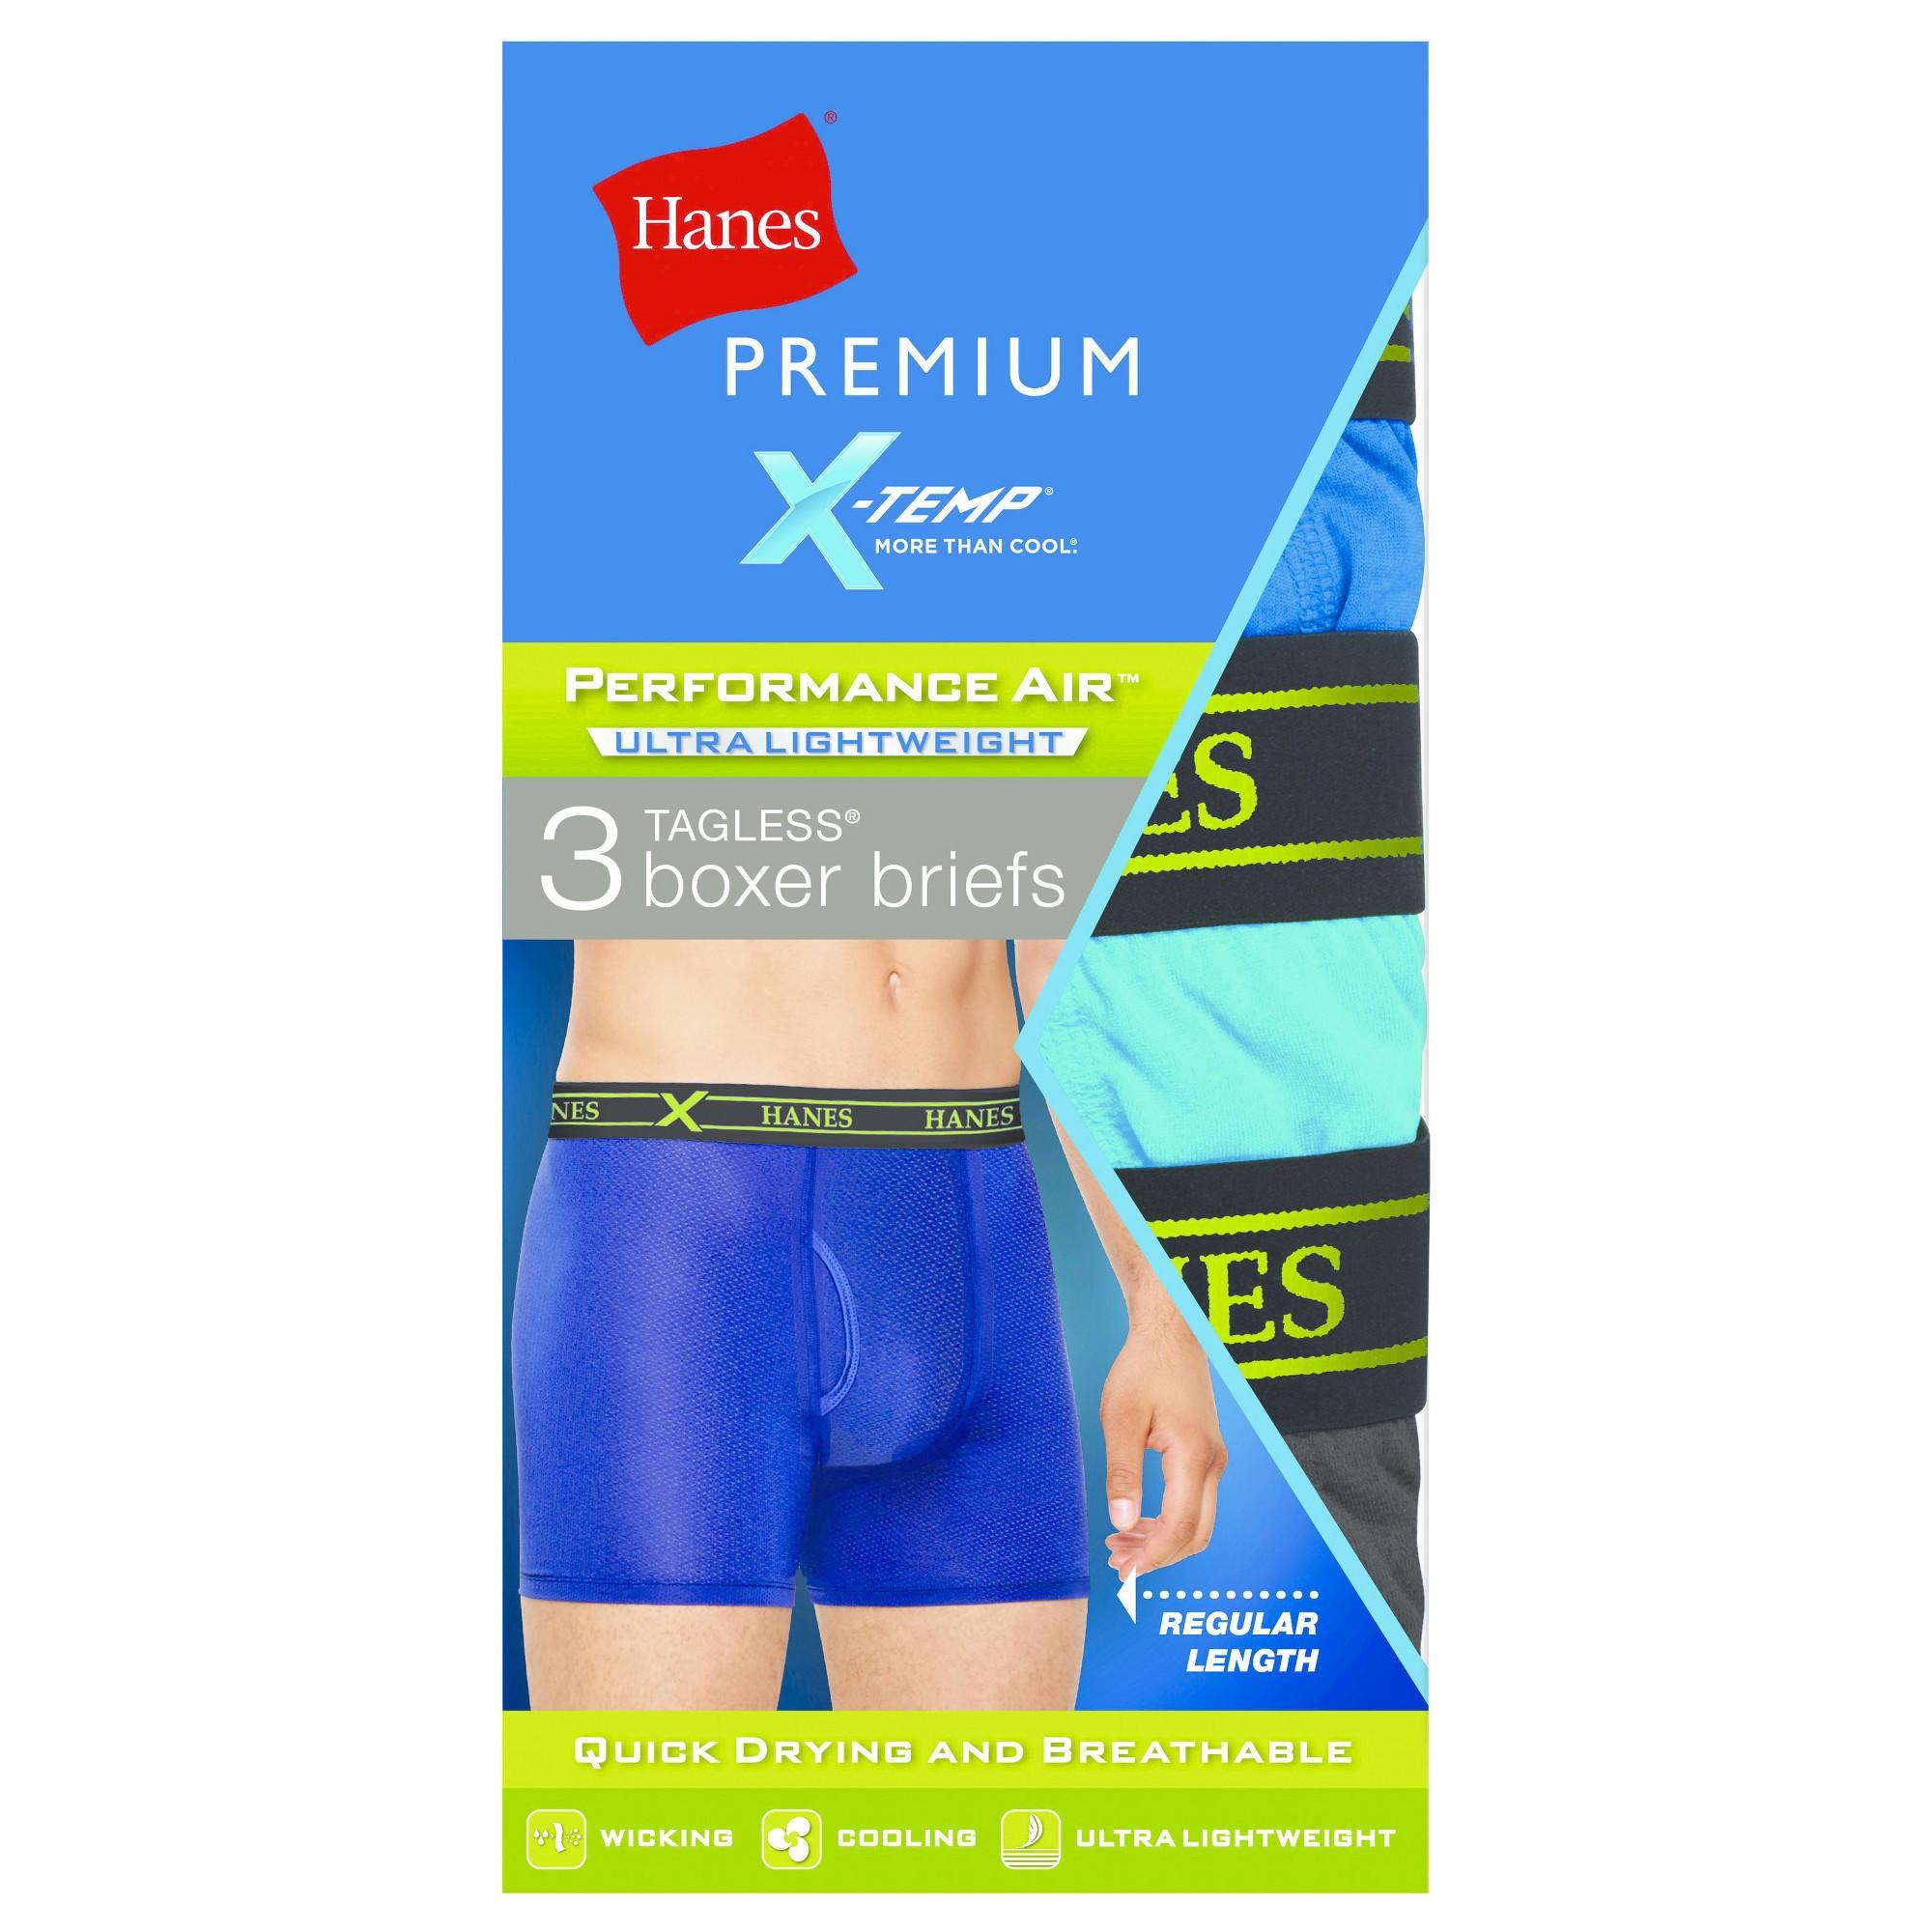 Hanes Premium Men's Performance Ultralight Boxer Briefs Colors Vary - L, Multicolored